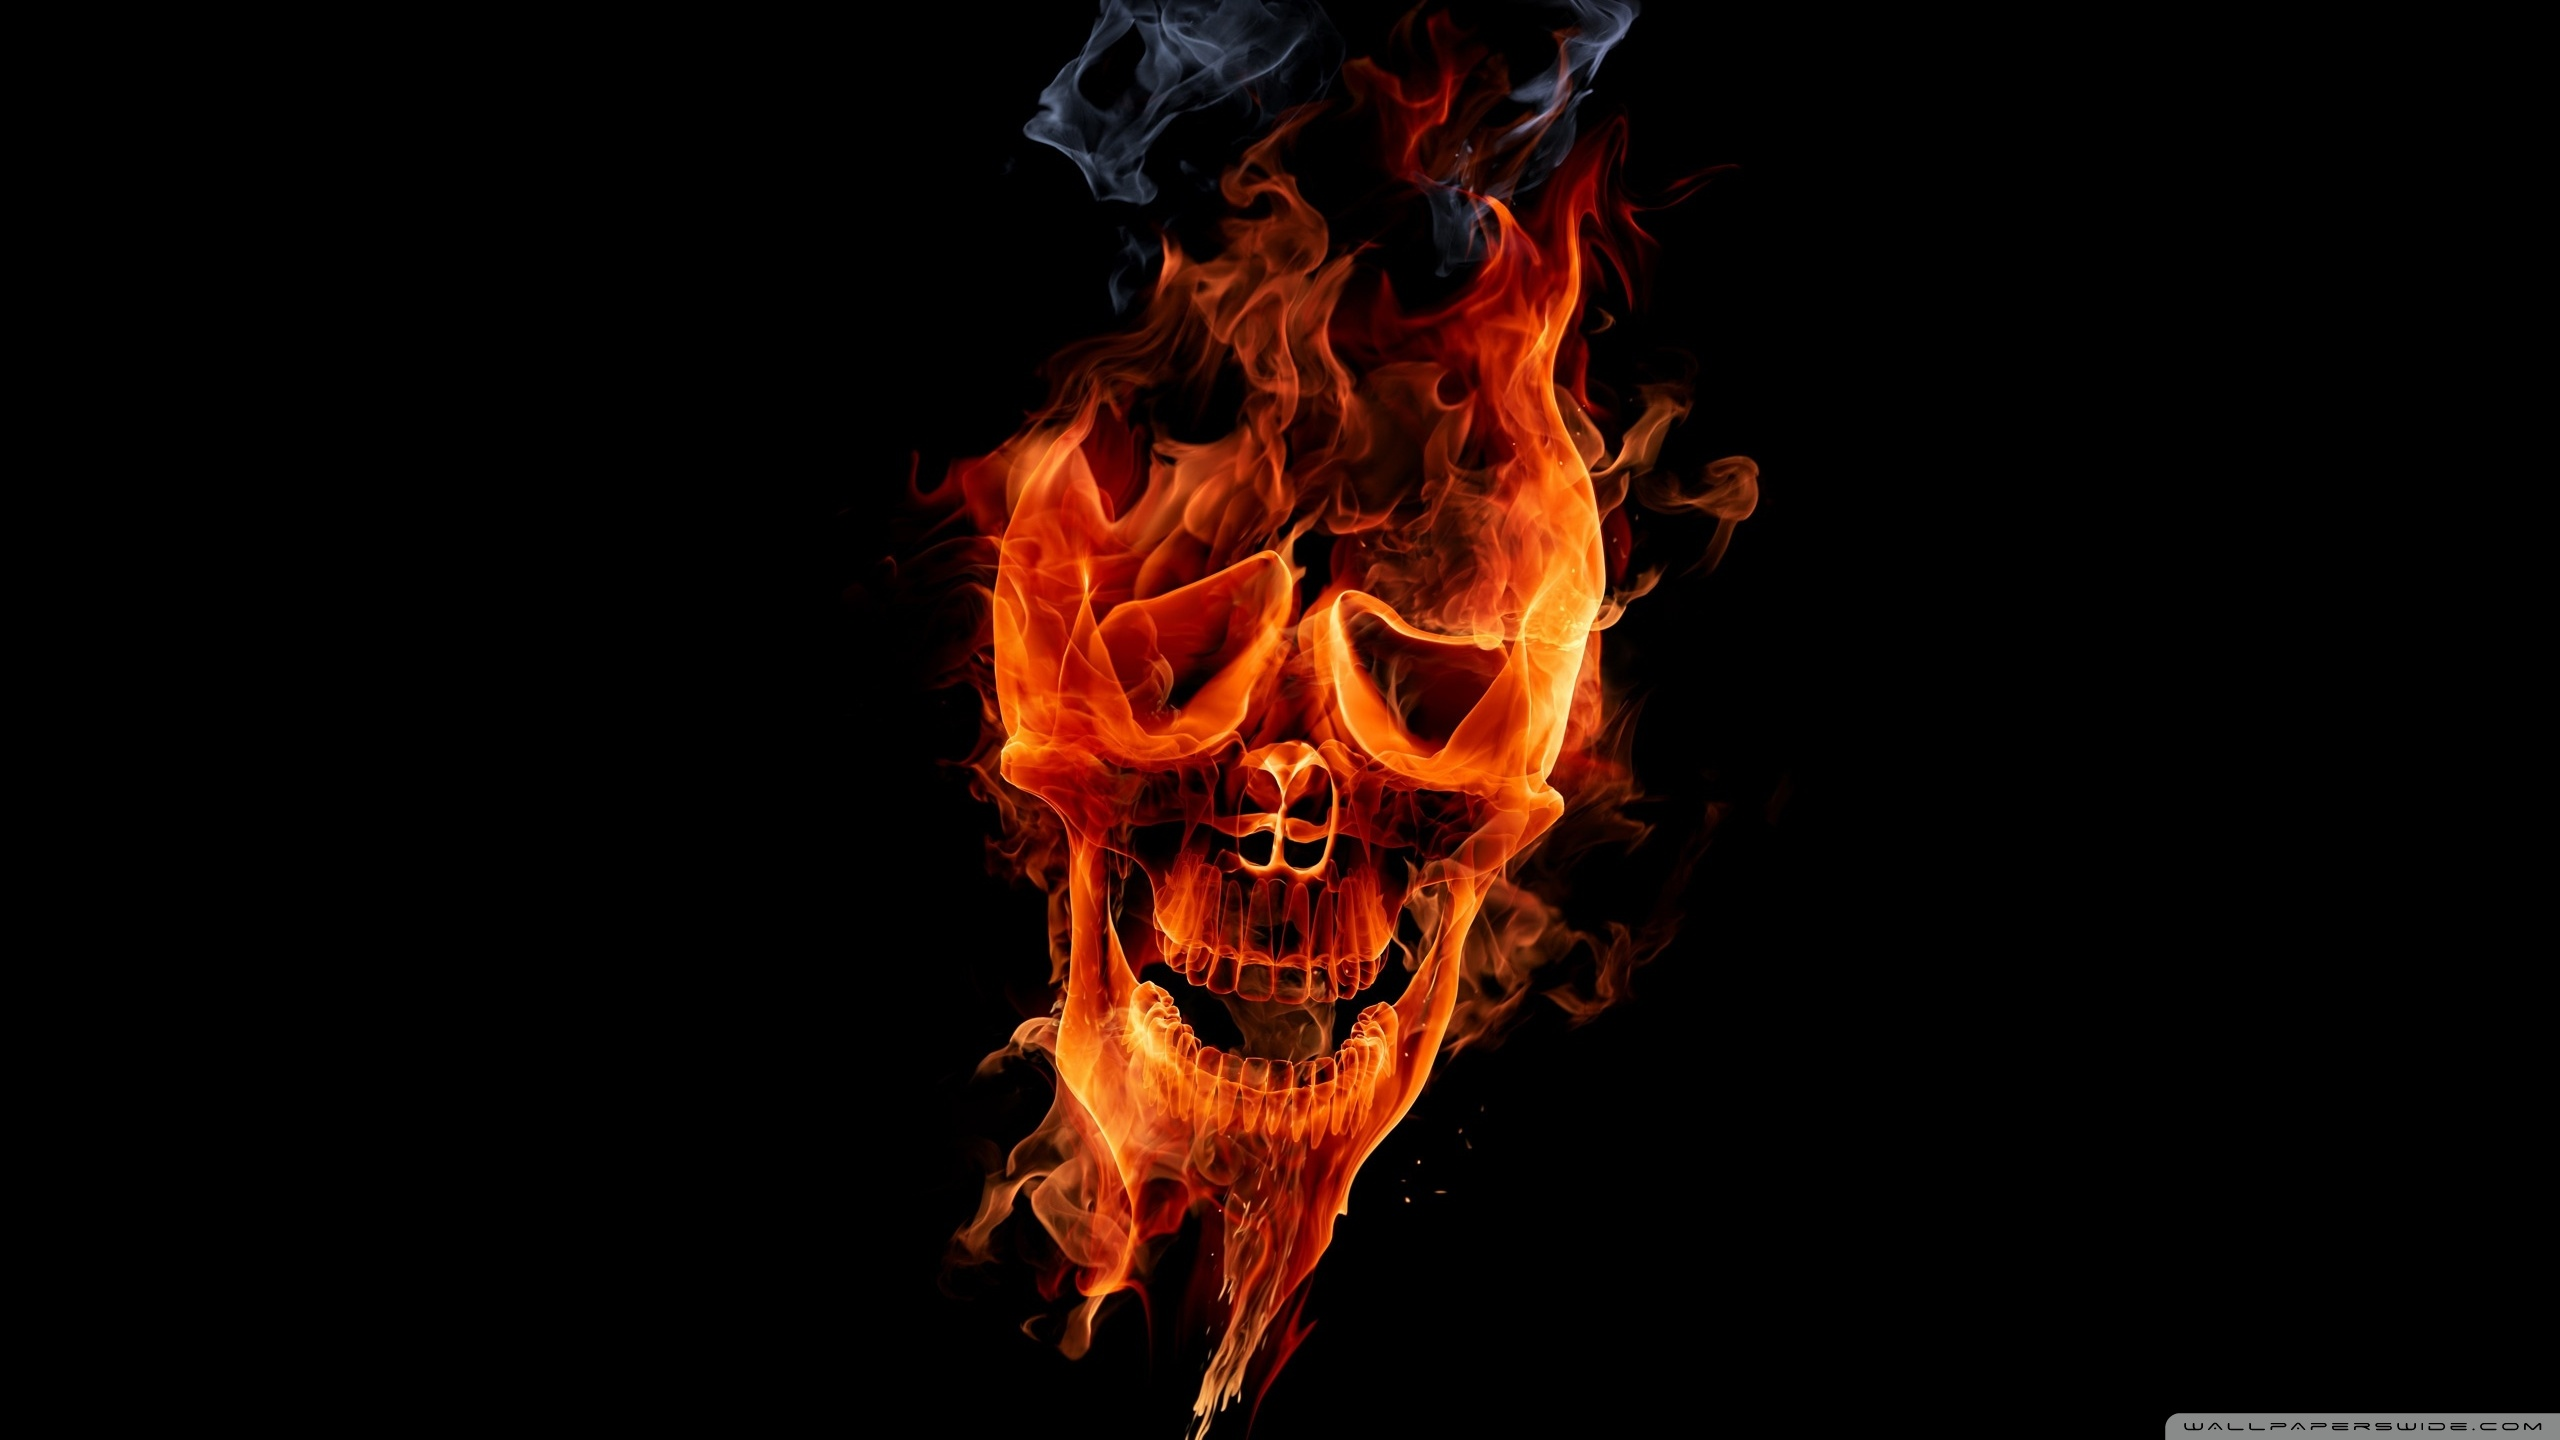 Standard - Fire Skull , HD Wallpaper & Backgrounds